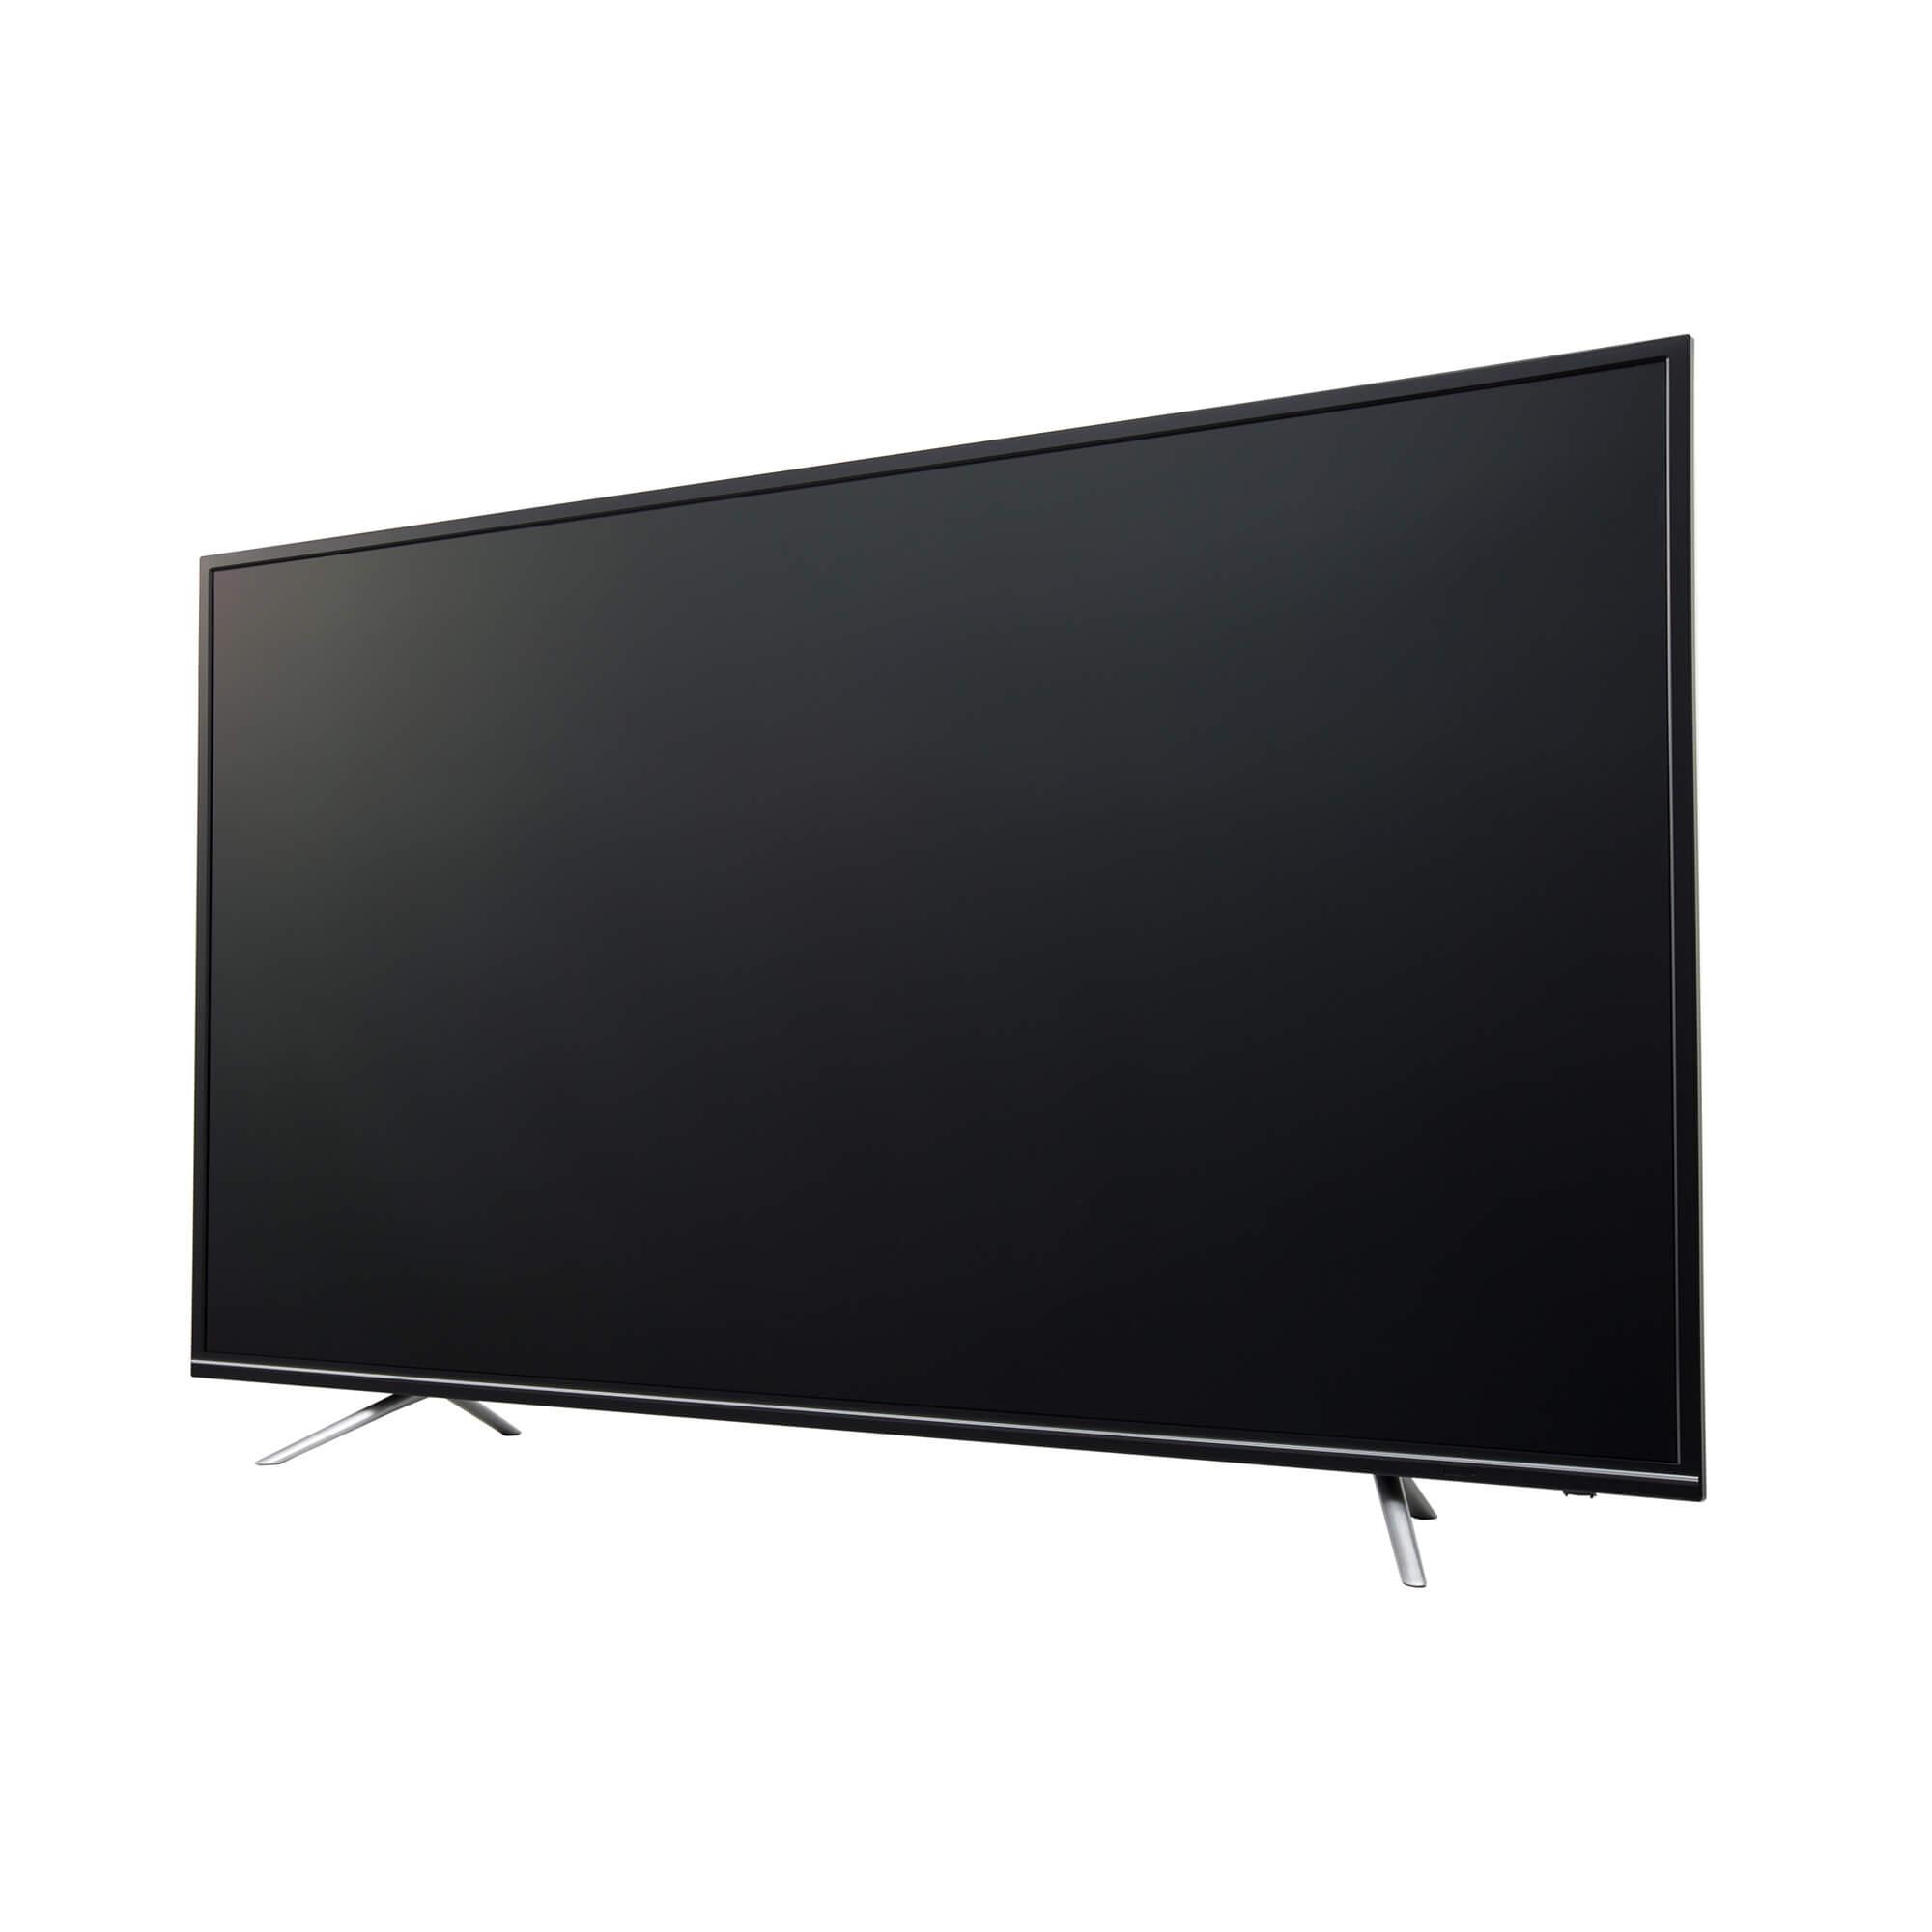 GH-TV65G-BK